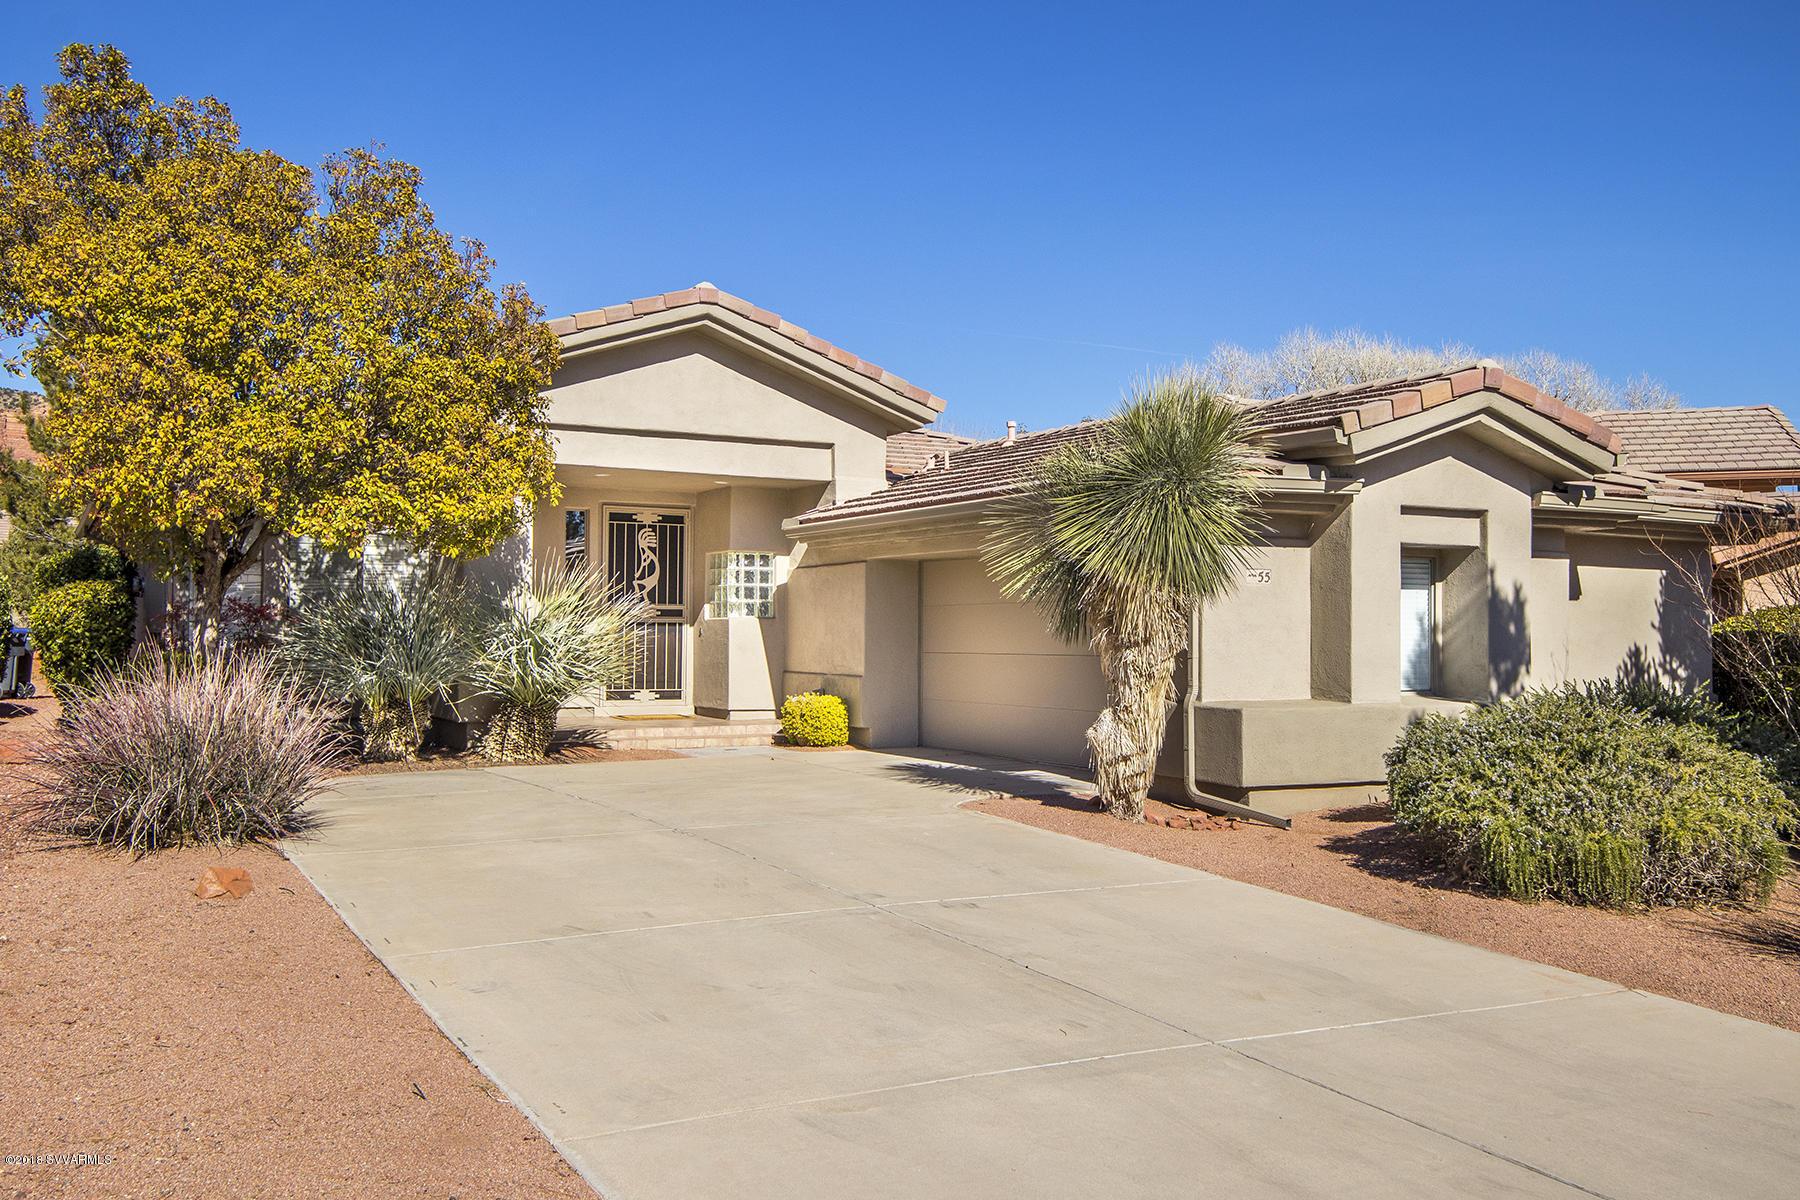 55 Heritage Circle Sedona, AZ 86351